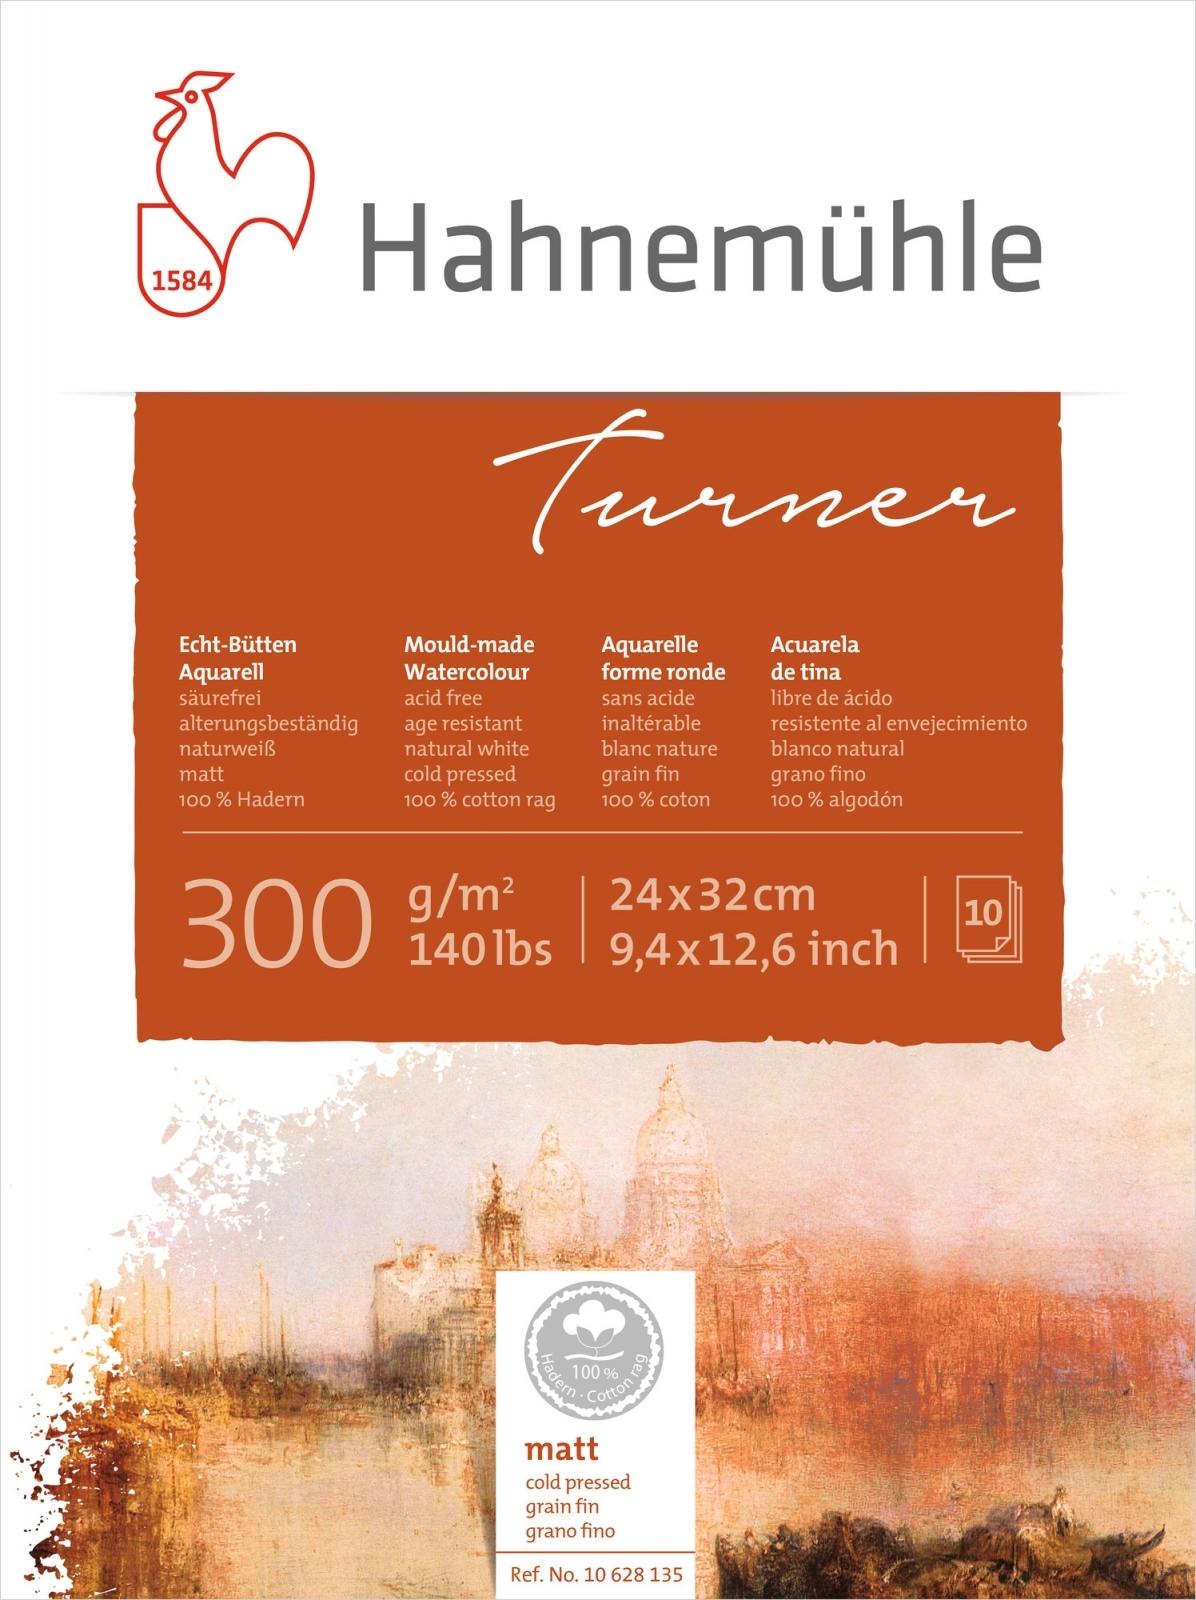 Papel Hahnemuhle William Turner Textura Fina 300g/m2 24x32 10fls (10628135) - Papelaria Botafogo